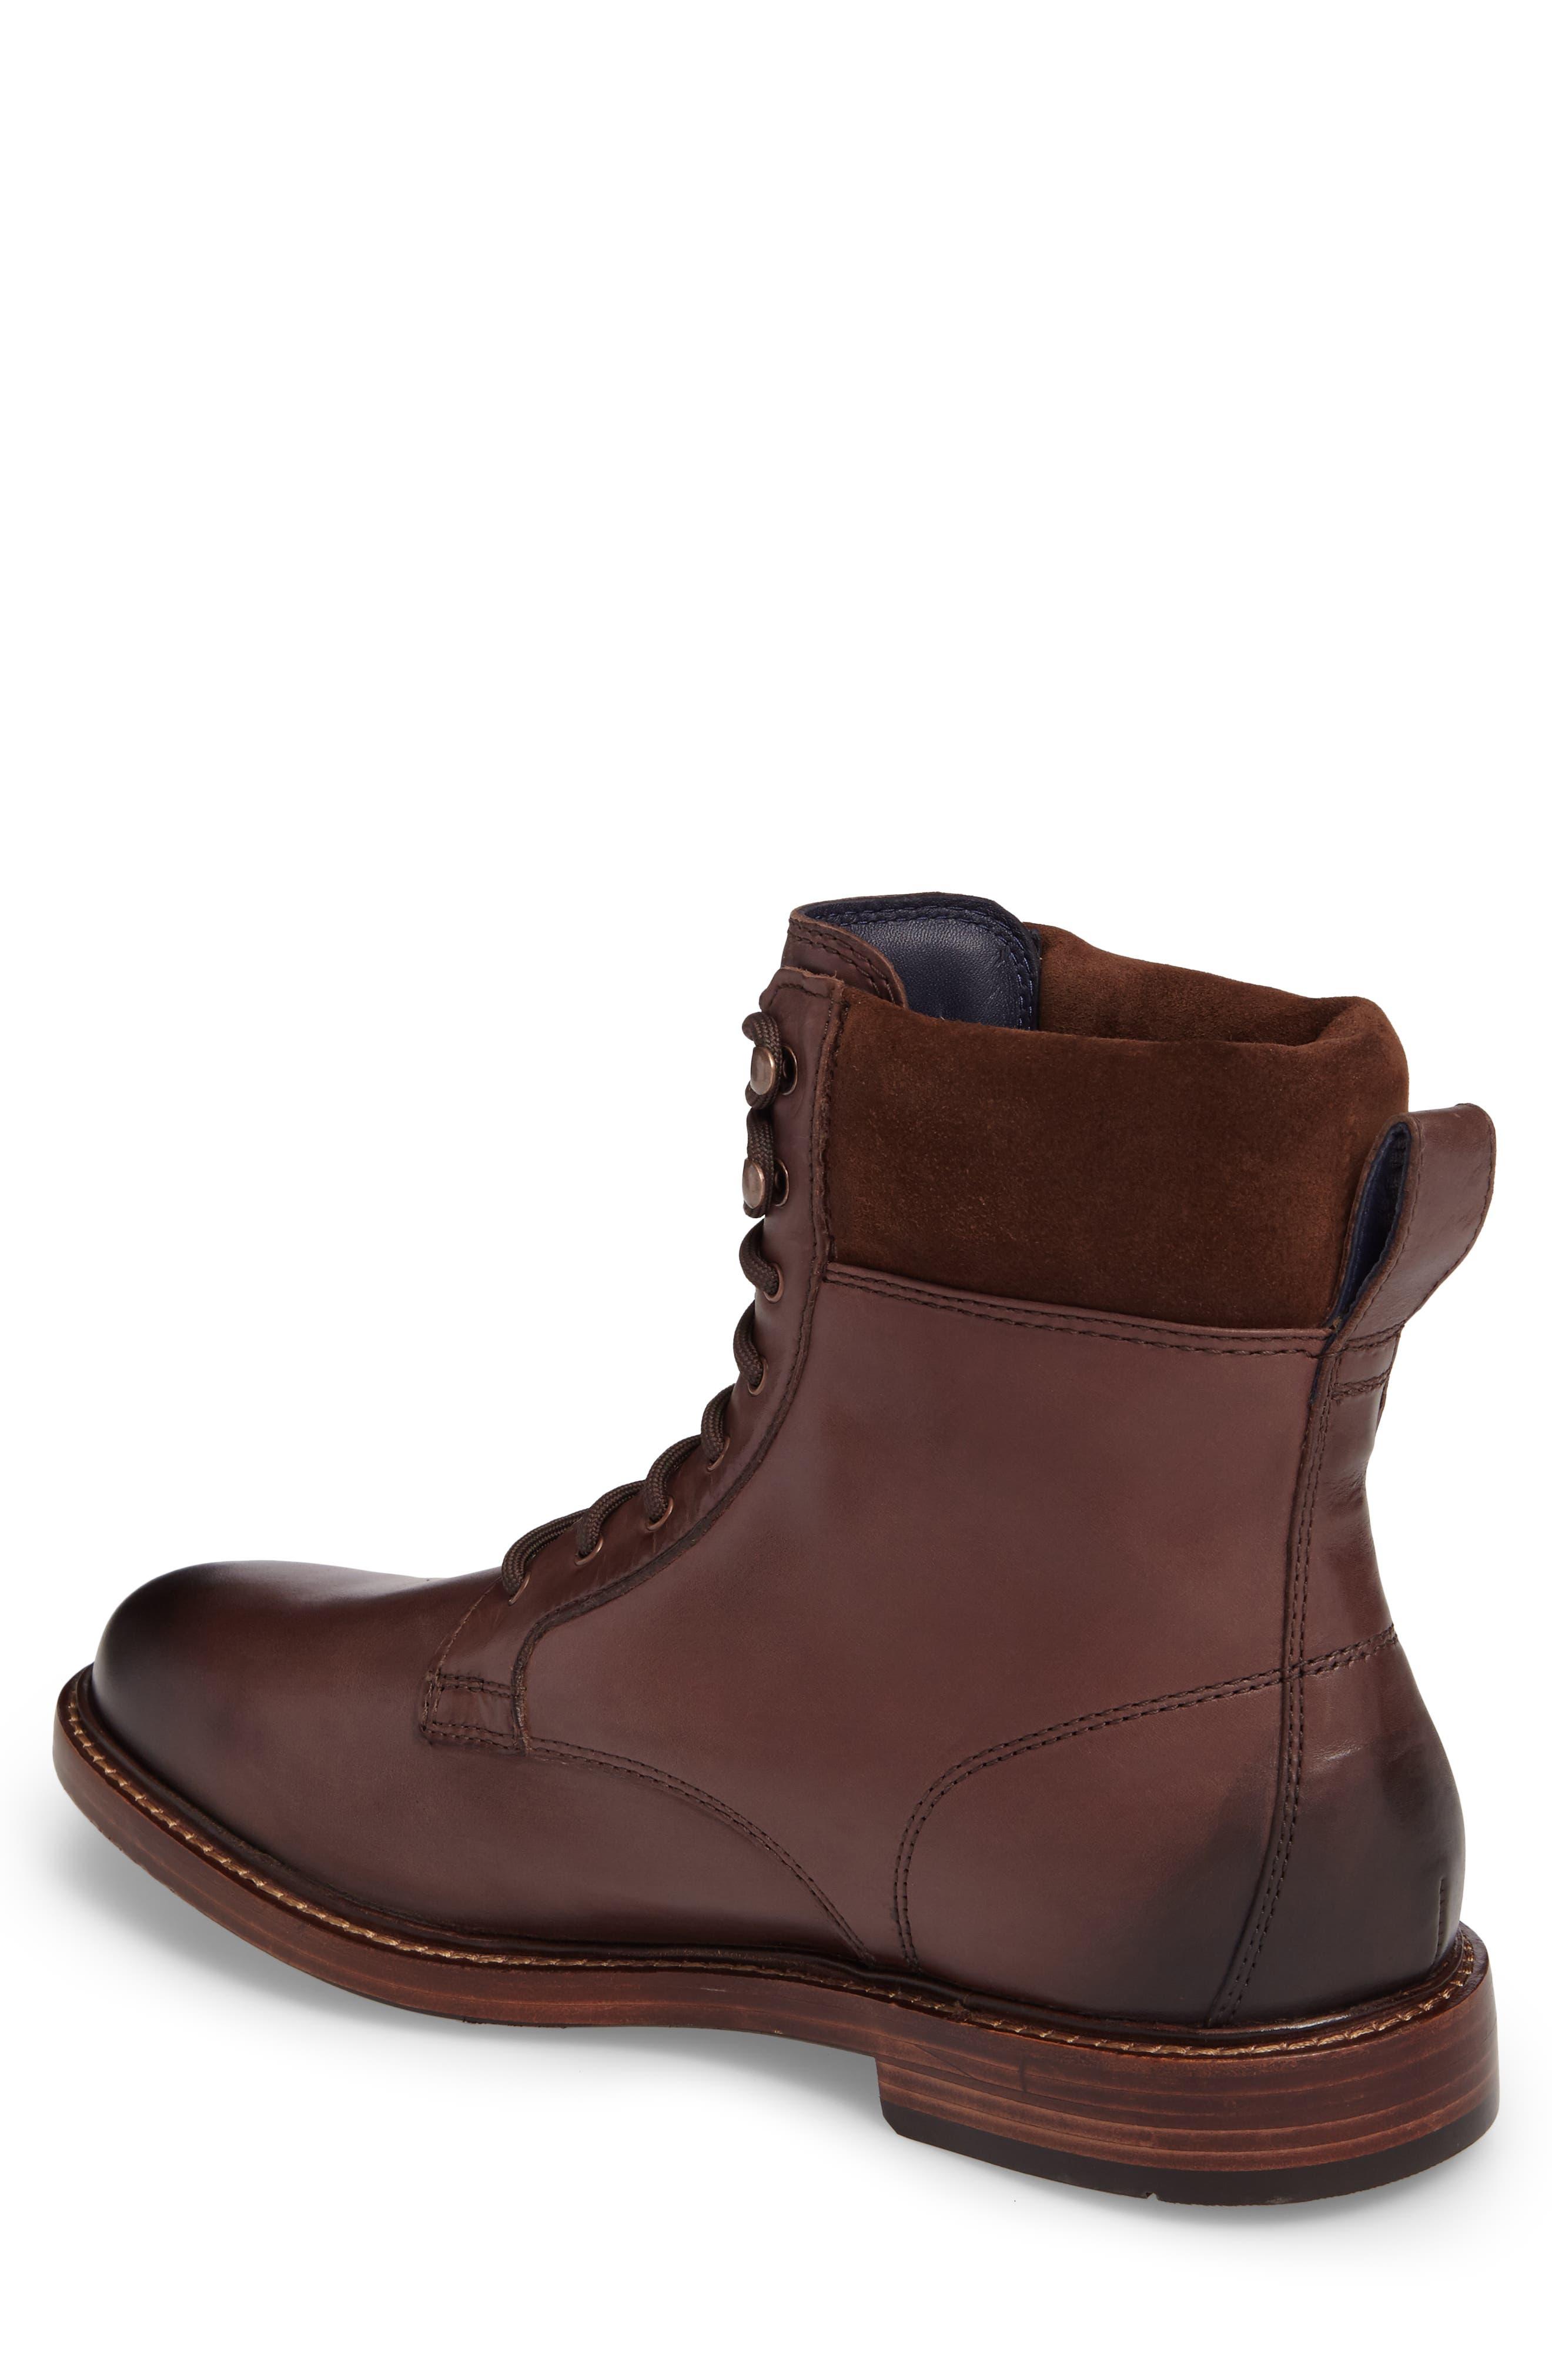 Tyler Grand Plain Toe Boot,                             Alternate thumbnail 2, color,                             205